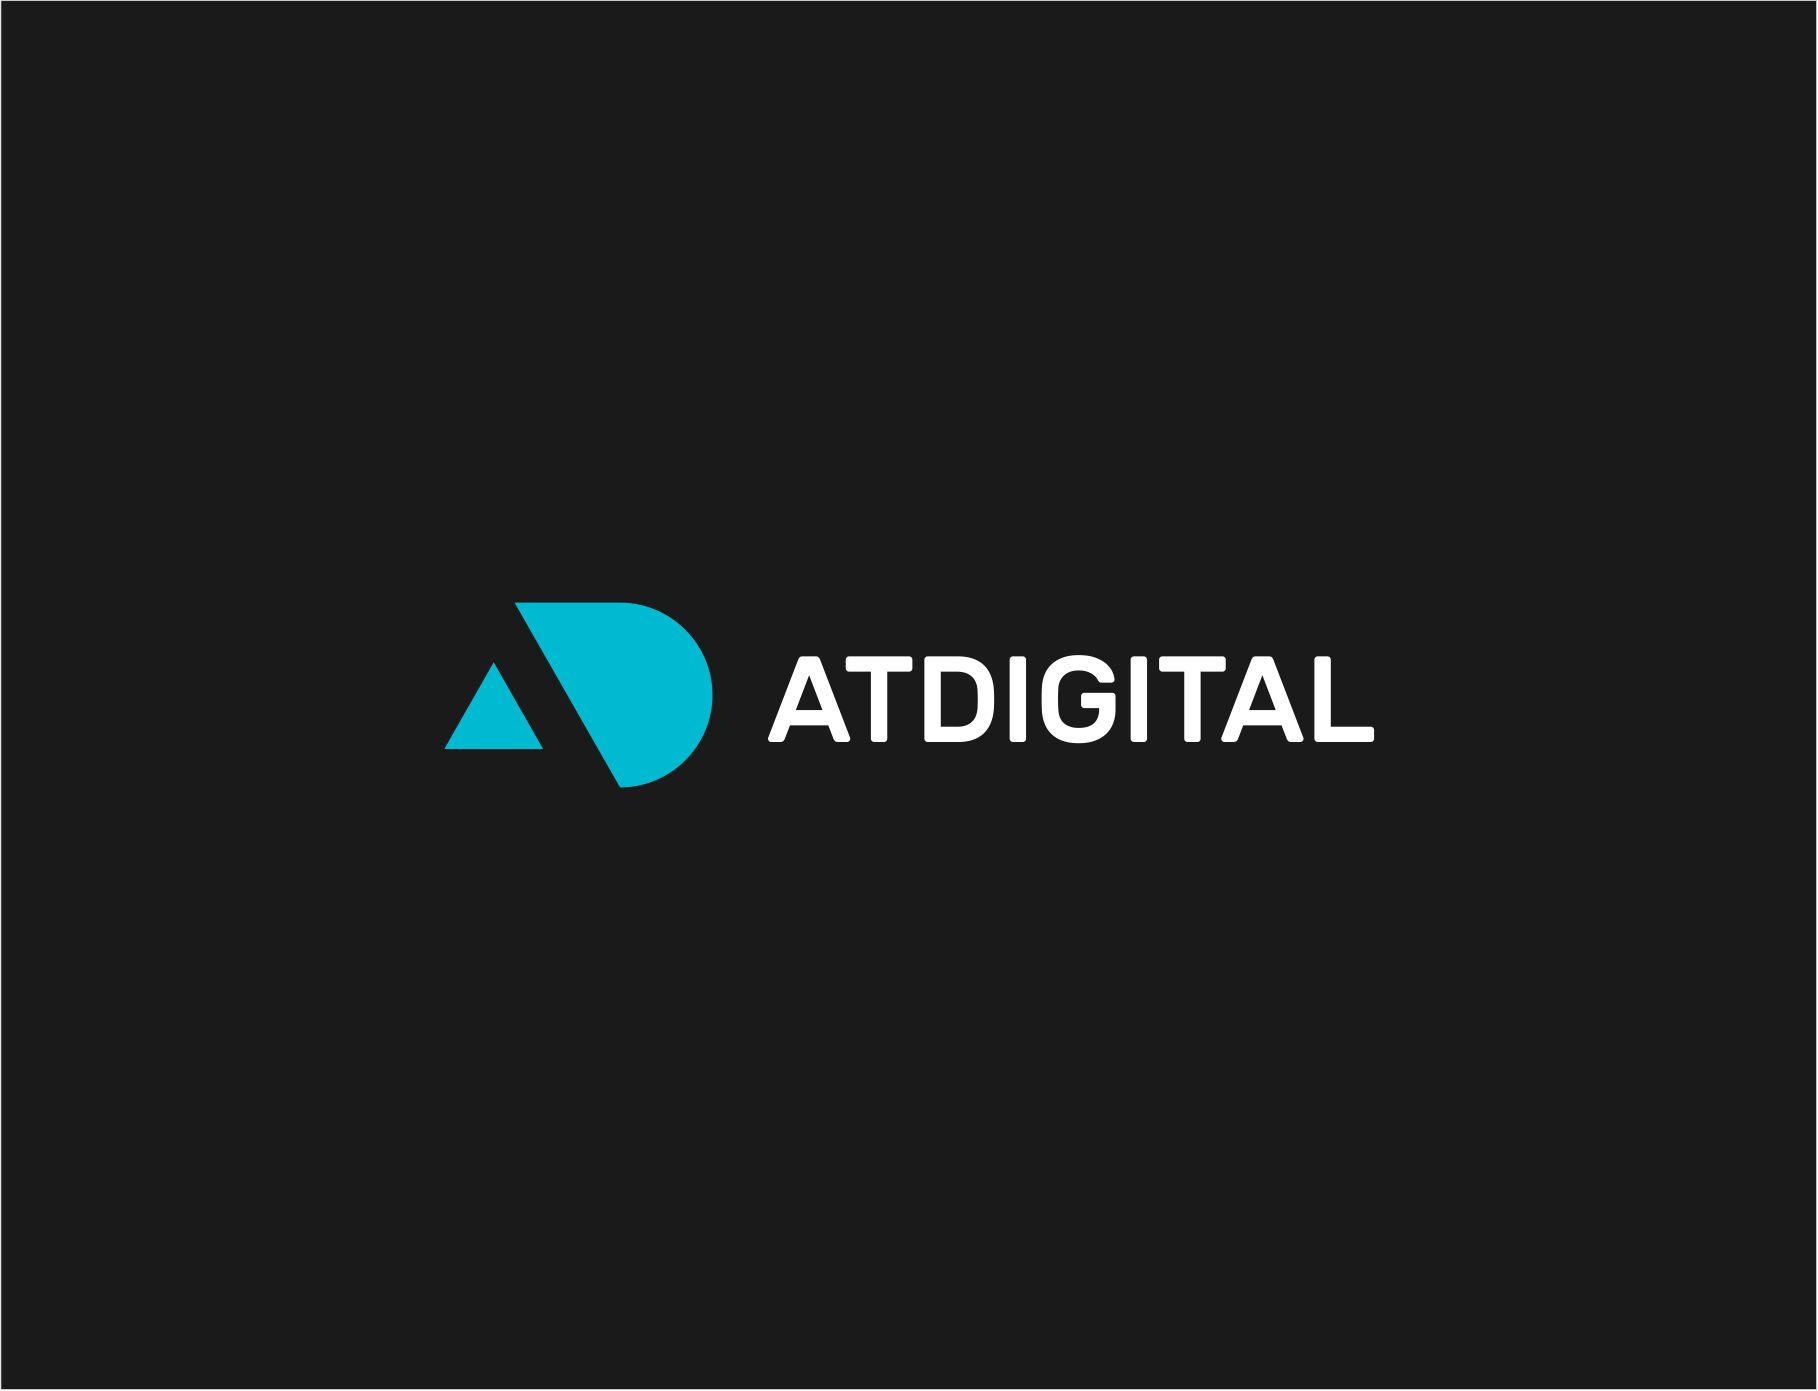 Логотип для ATDigital - дизайнер Zheentoro